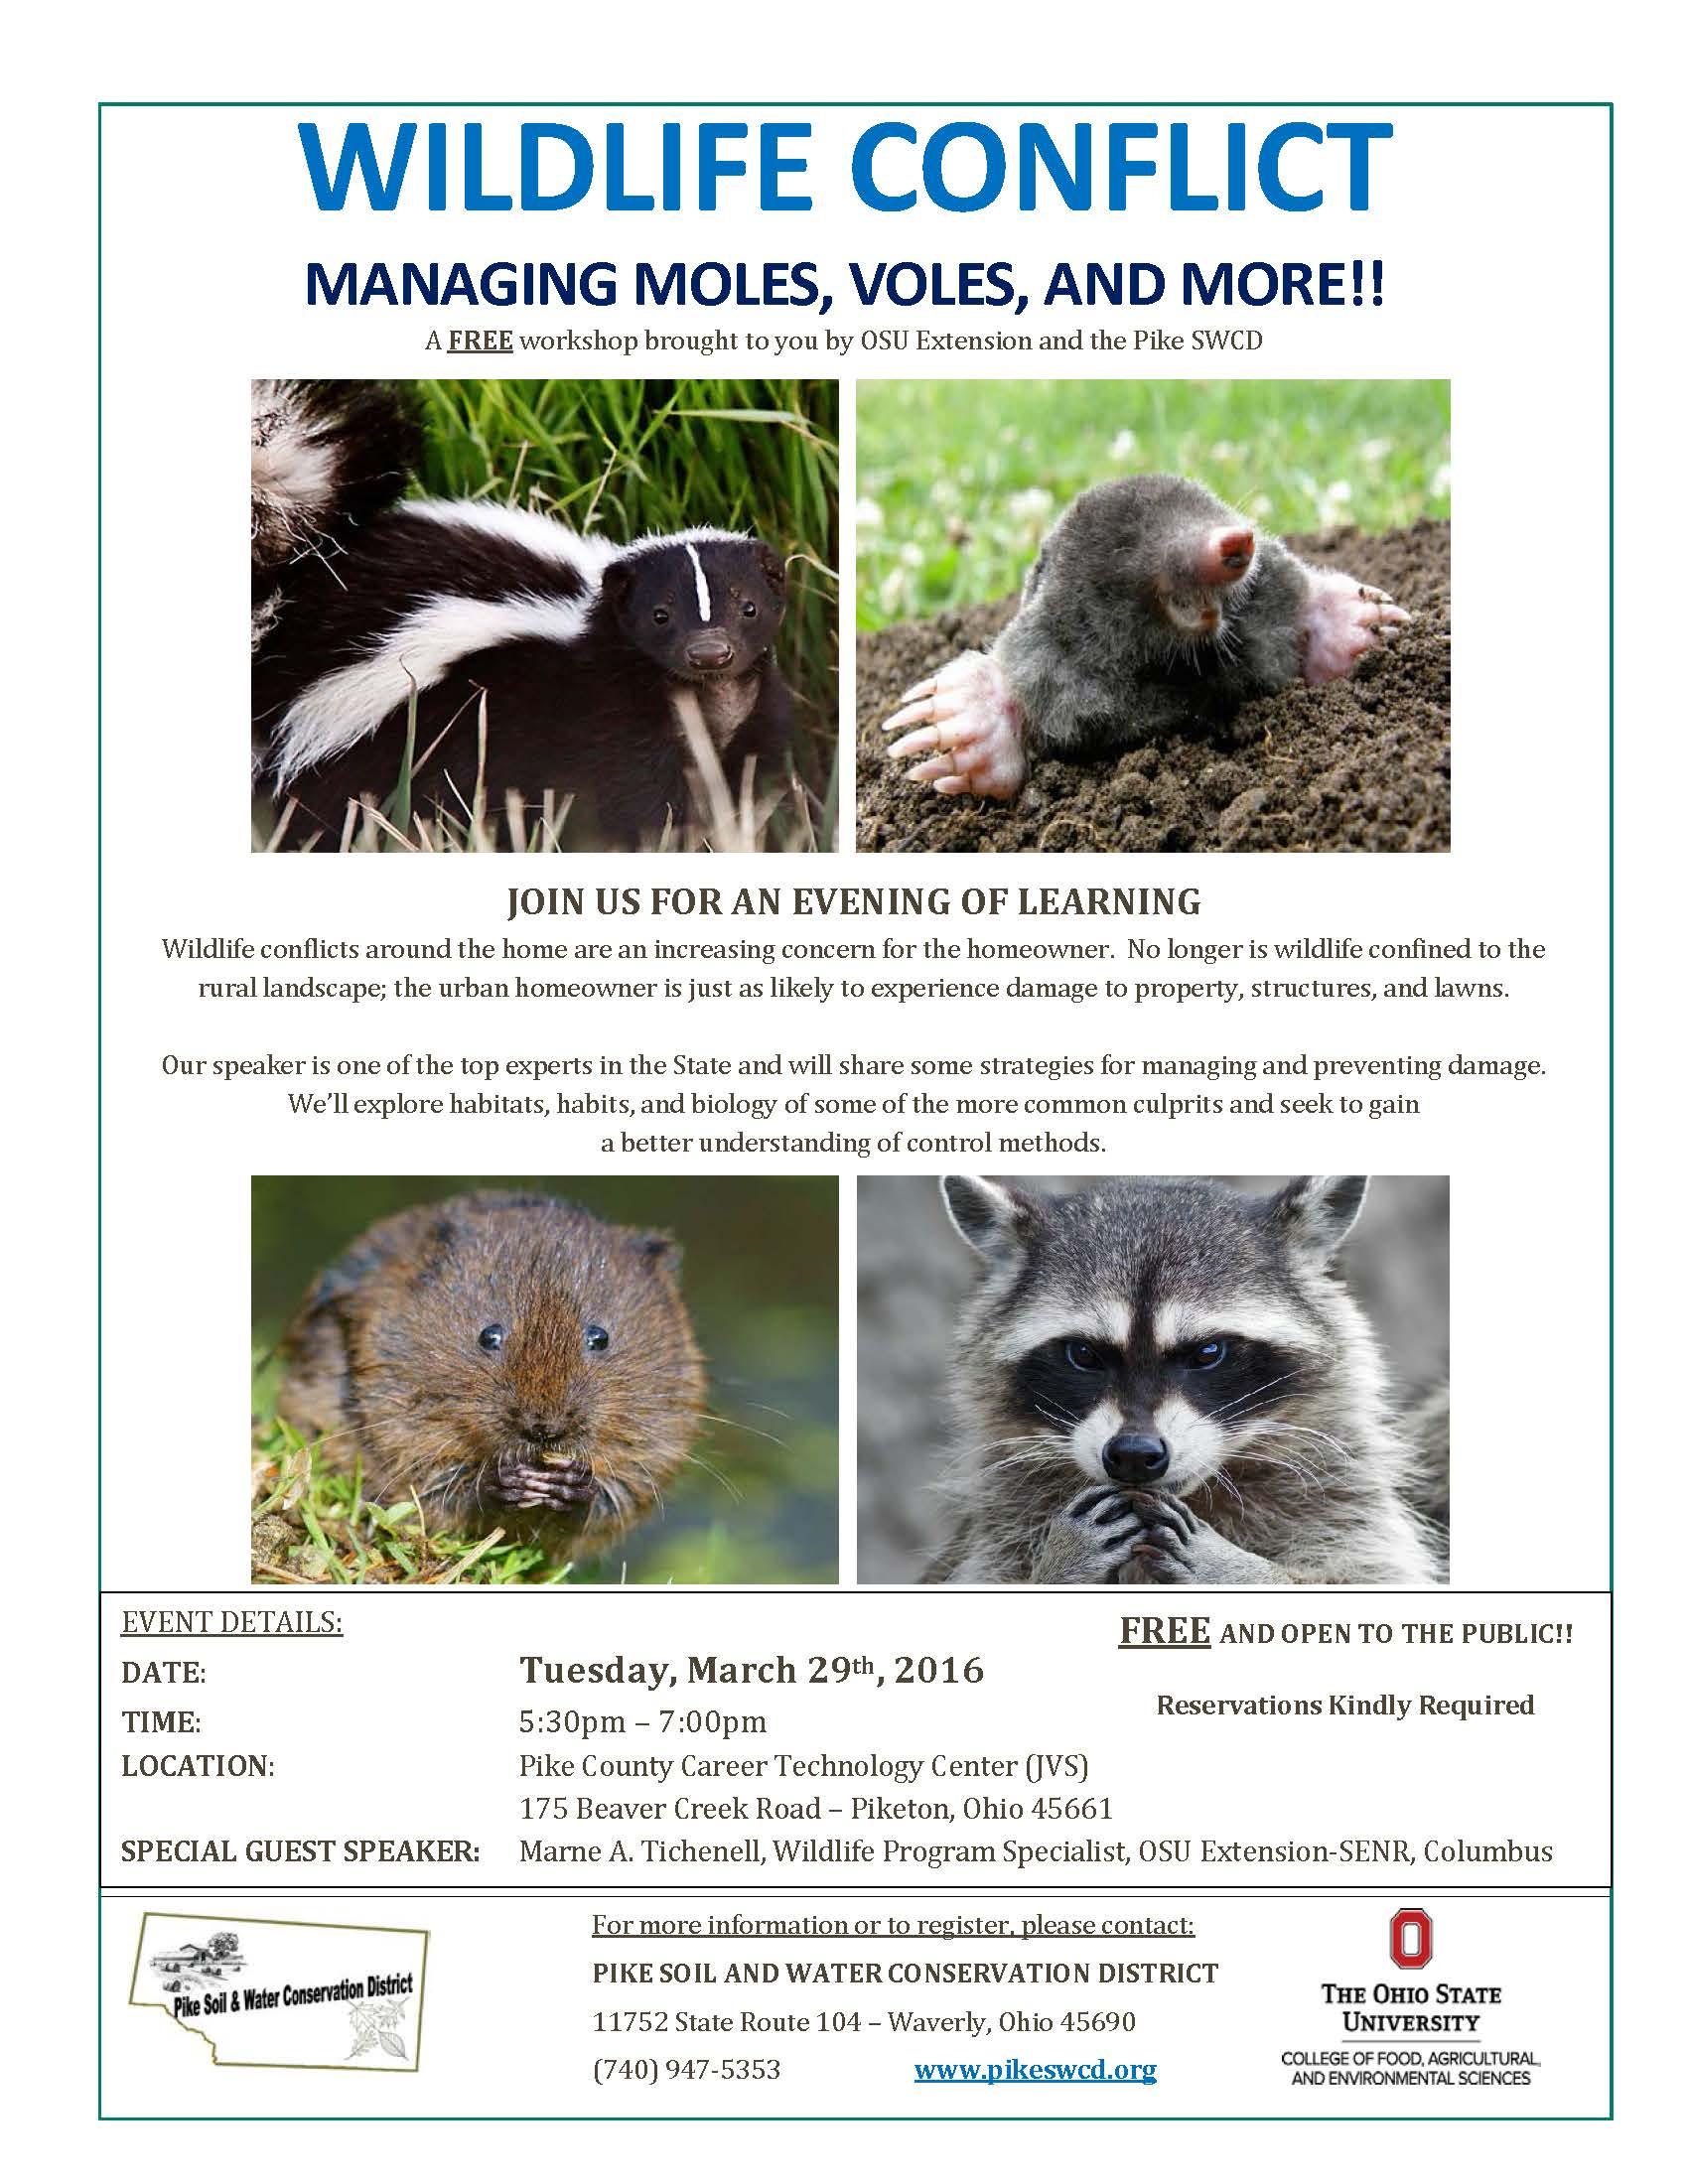 2016 Pike County Nuisance Wildlife Program